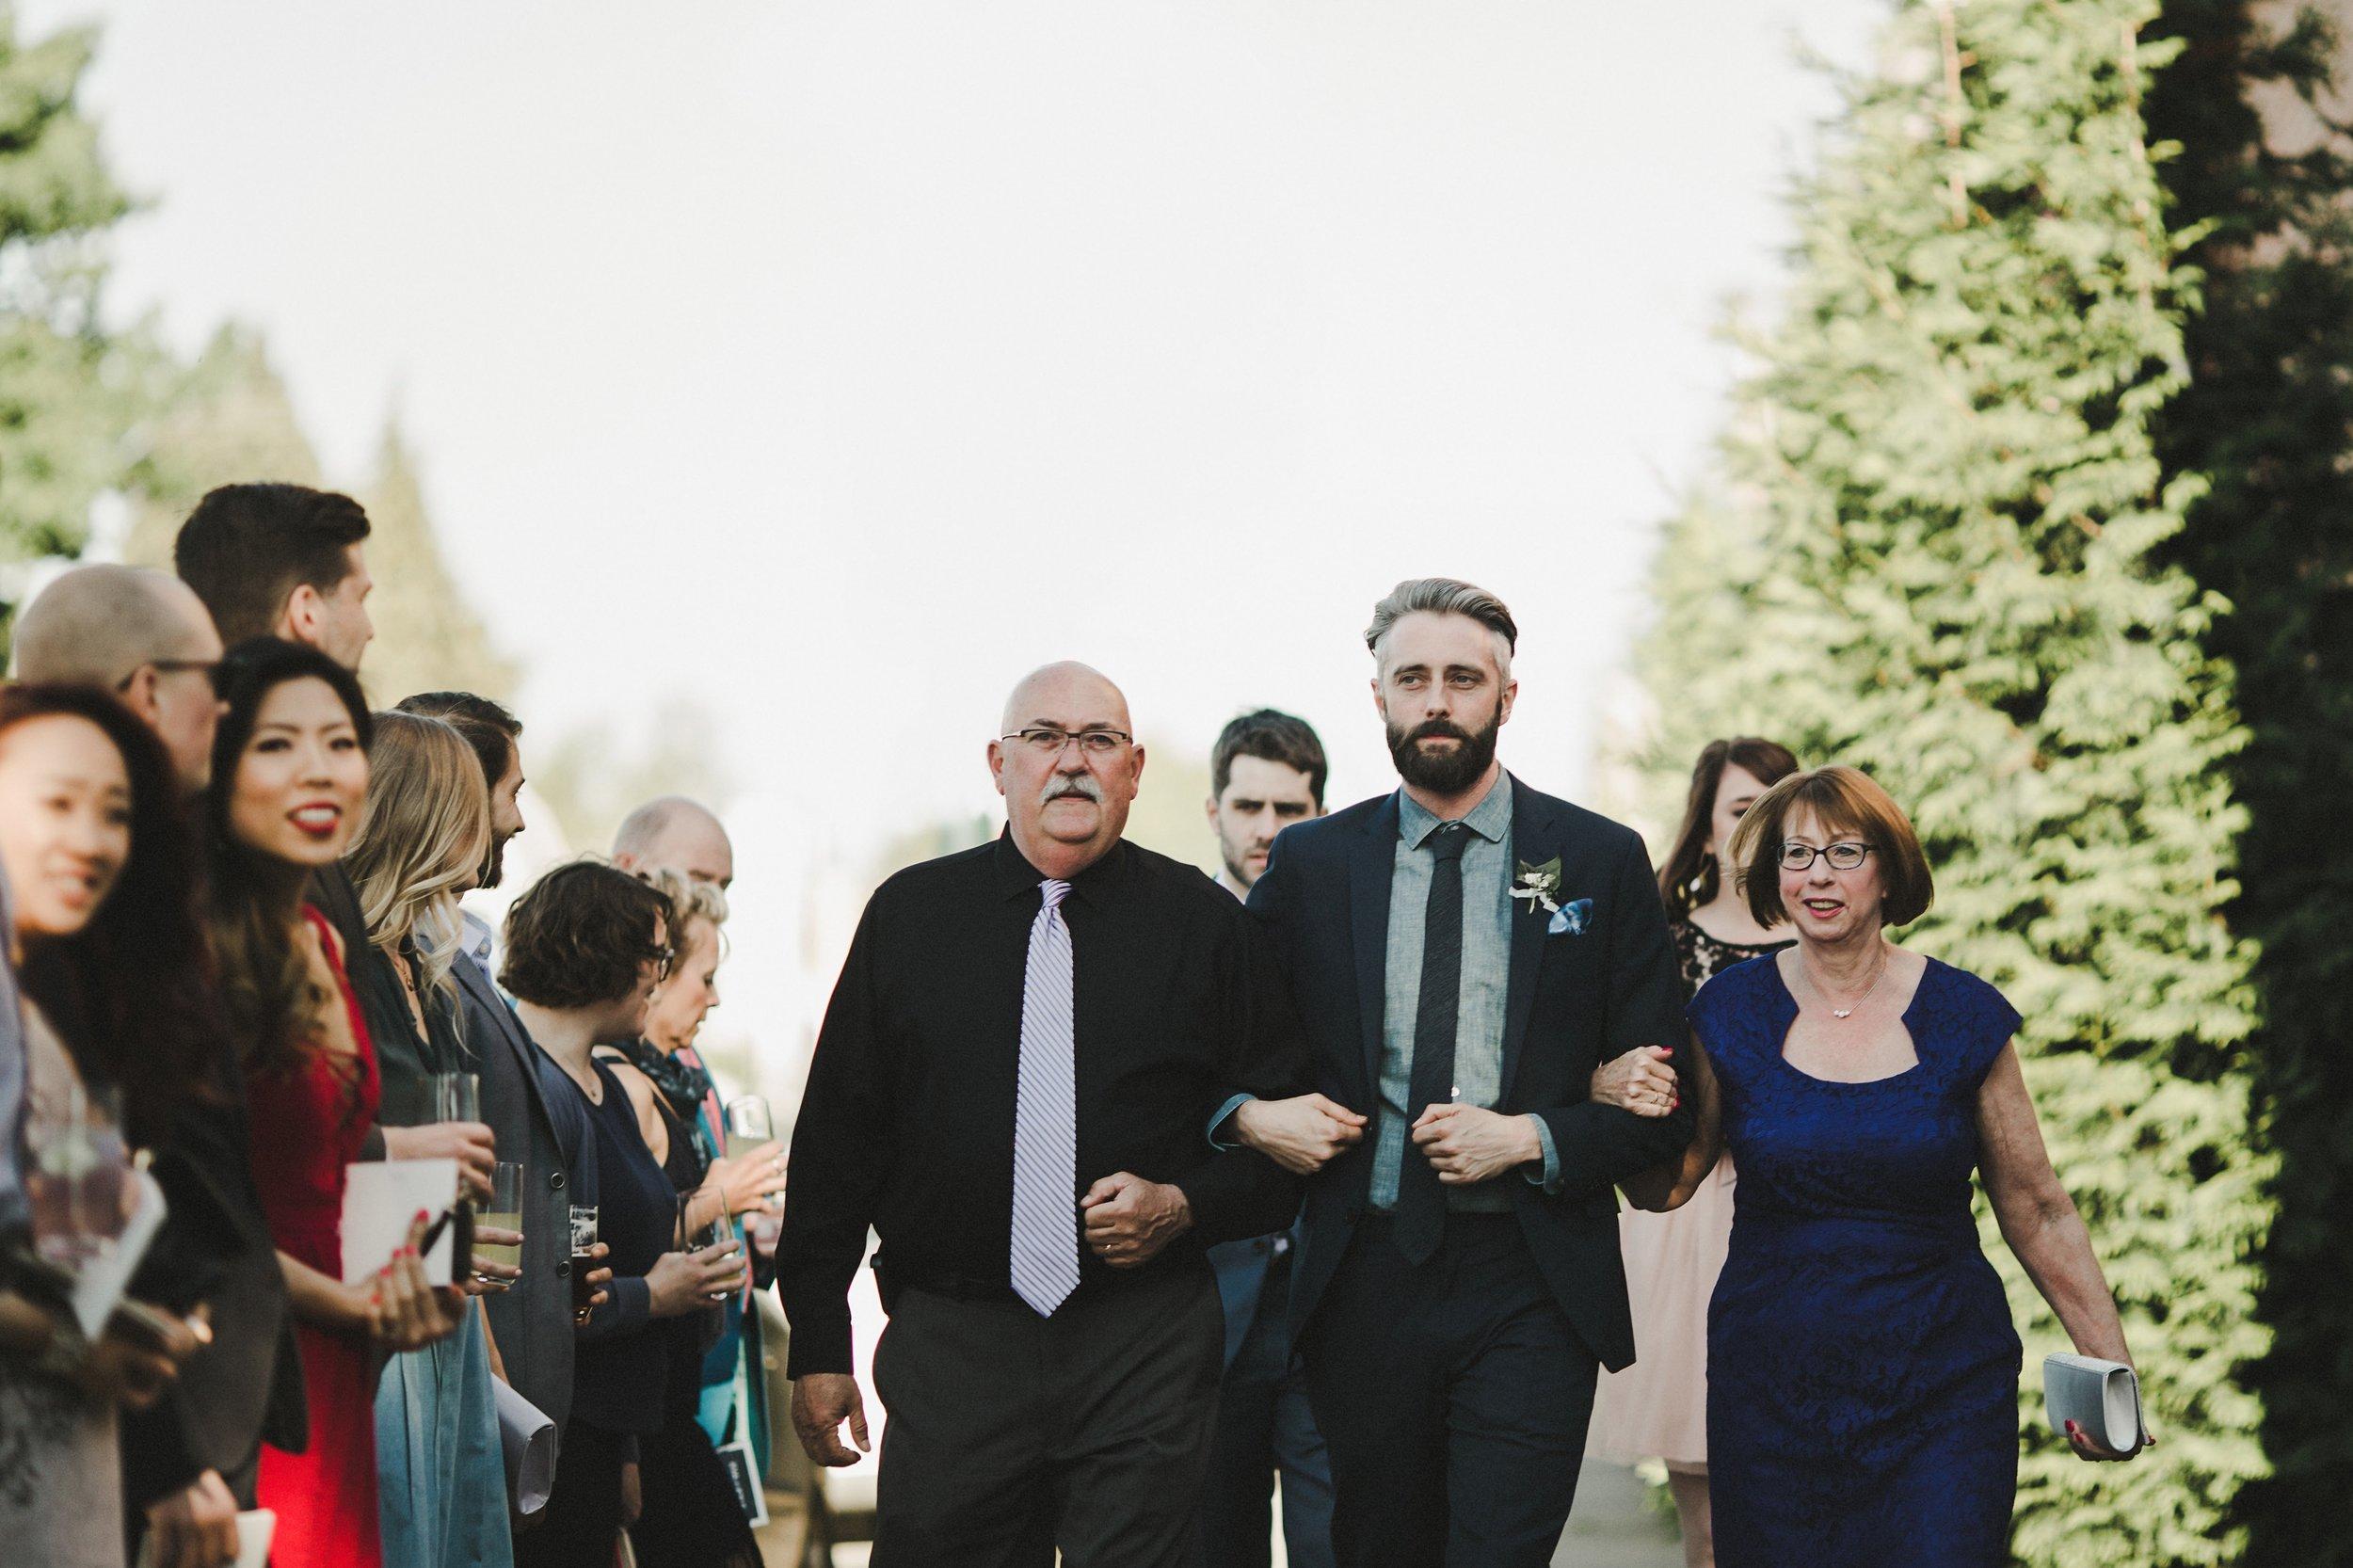 HOWE ABOUT FOREVA - Vancouver urban woodshop wedding by Shari + Mike photographers - alternative ceremony